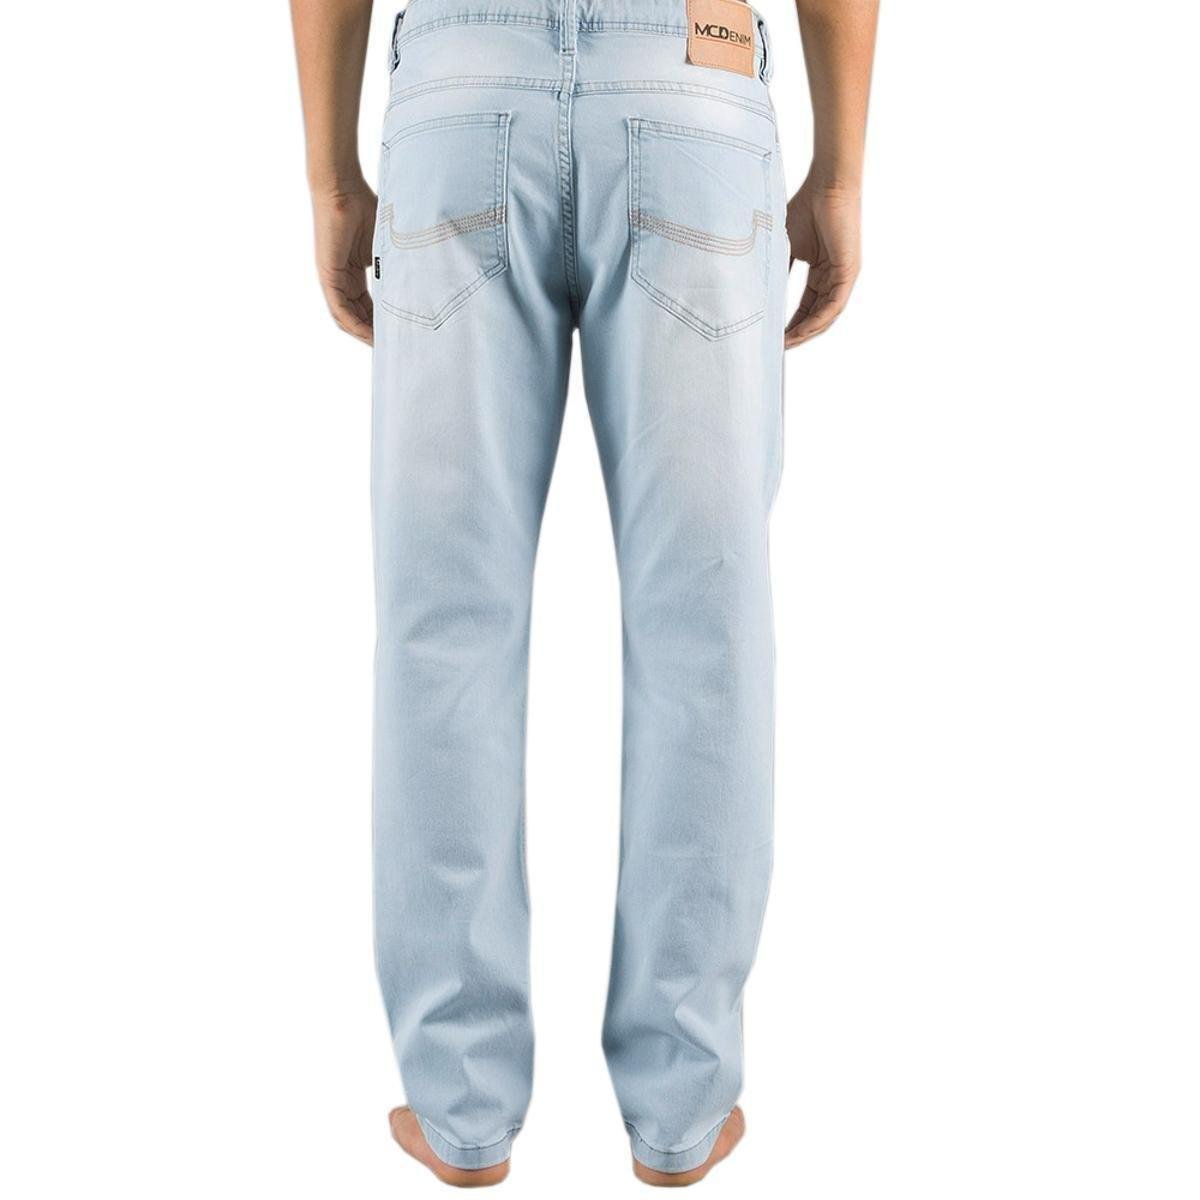 Calça MCD Jeans Sninny Acid Core Masculina - Azul